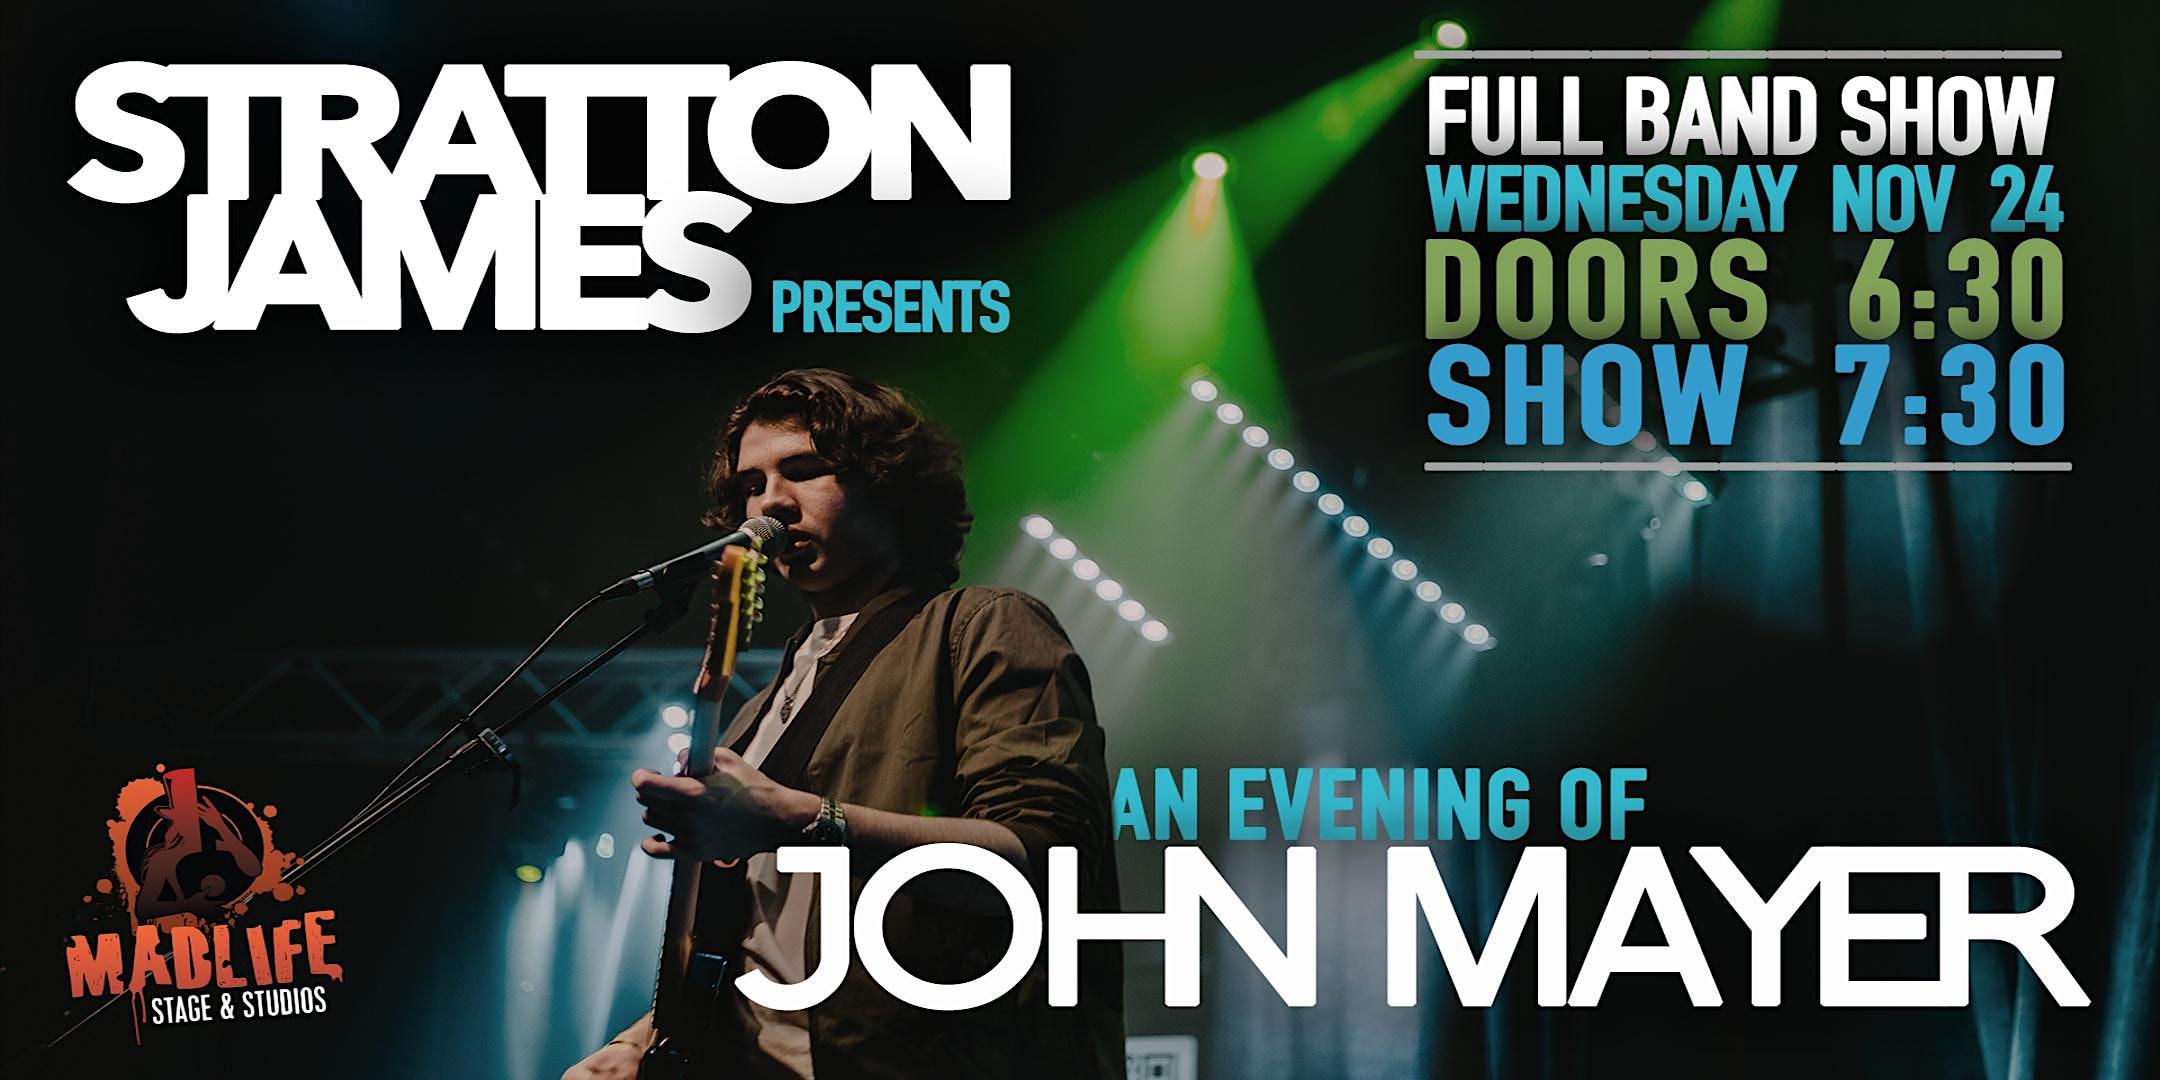 Stratton James presents An Evening of John Mayer